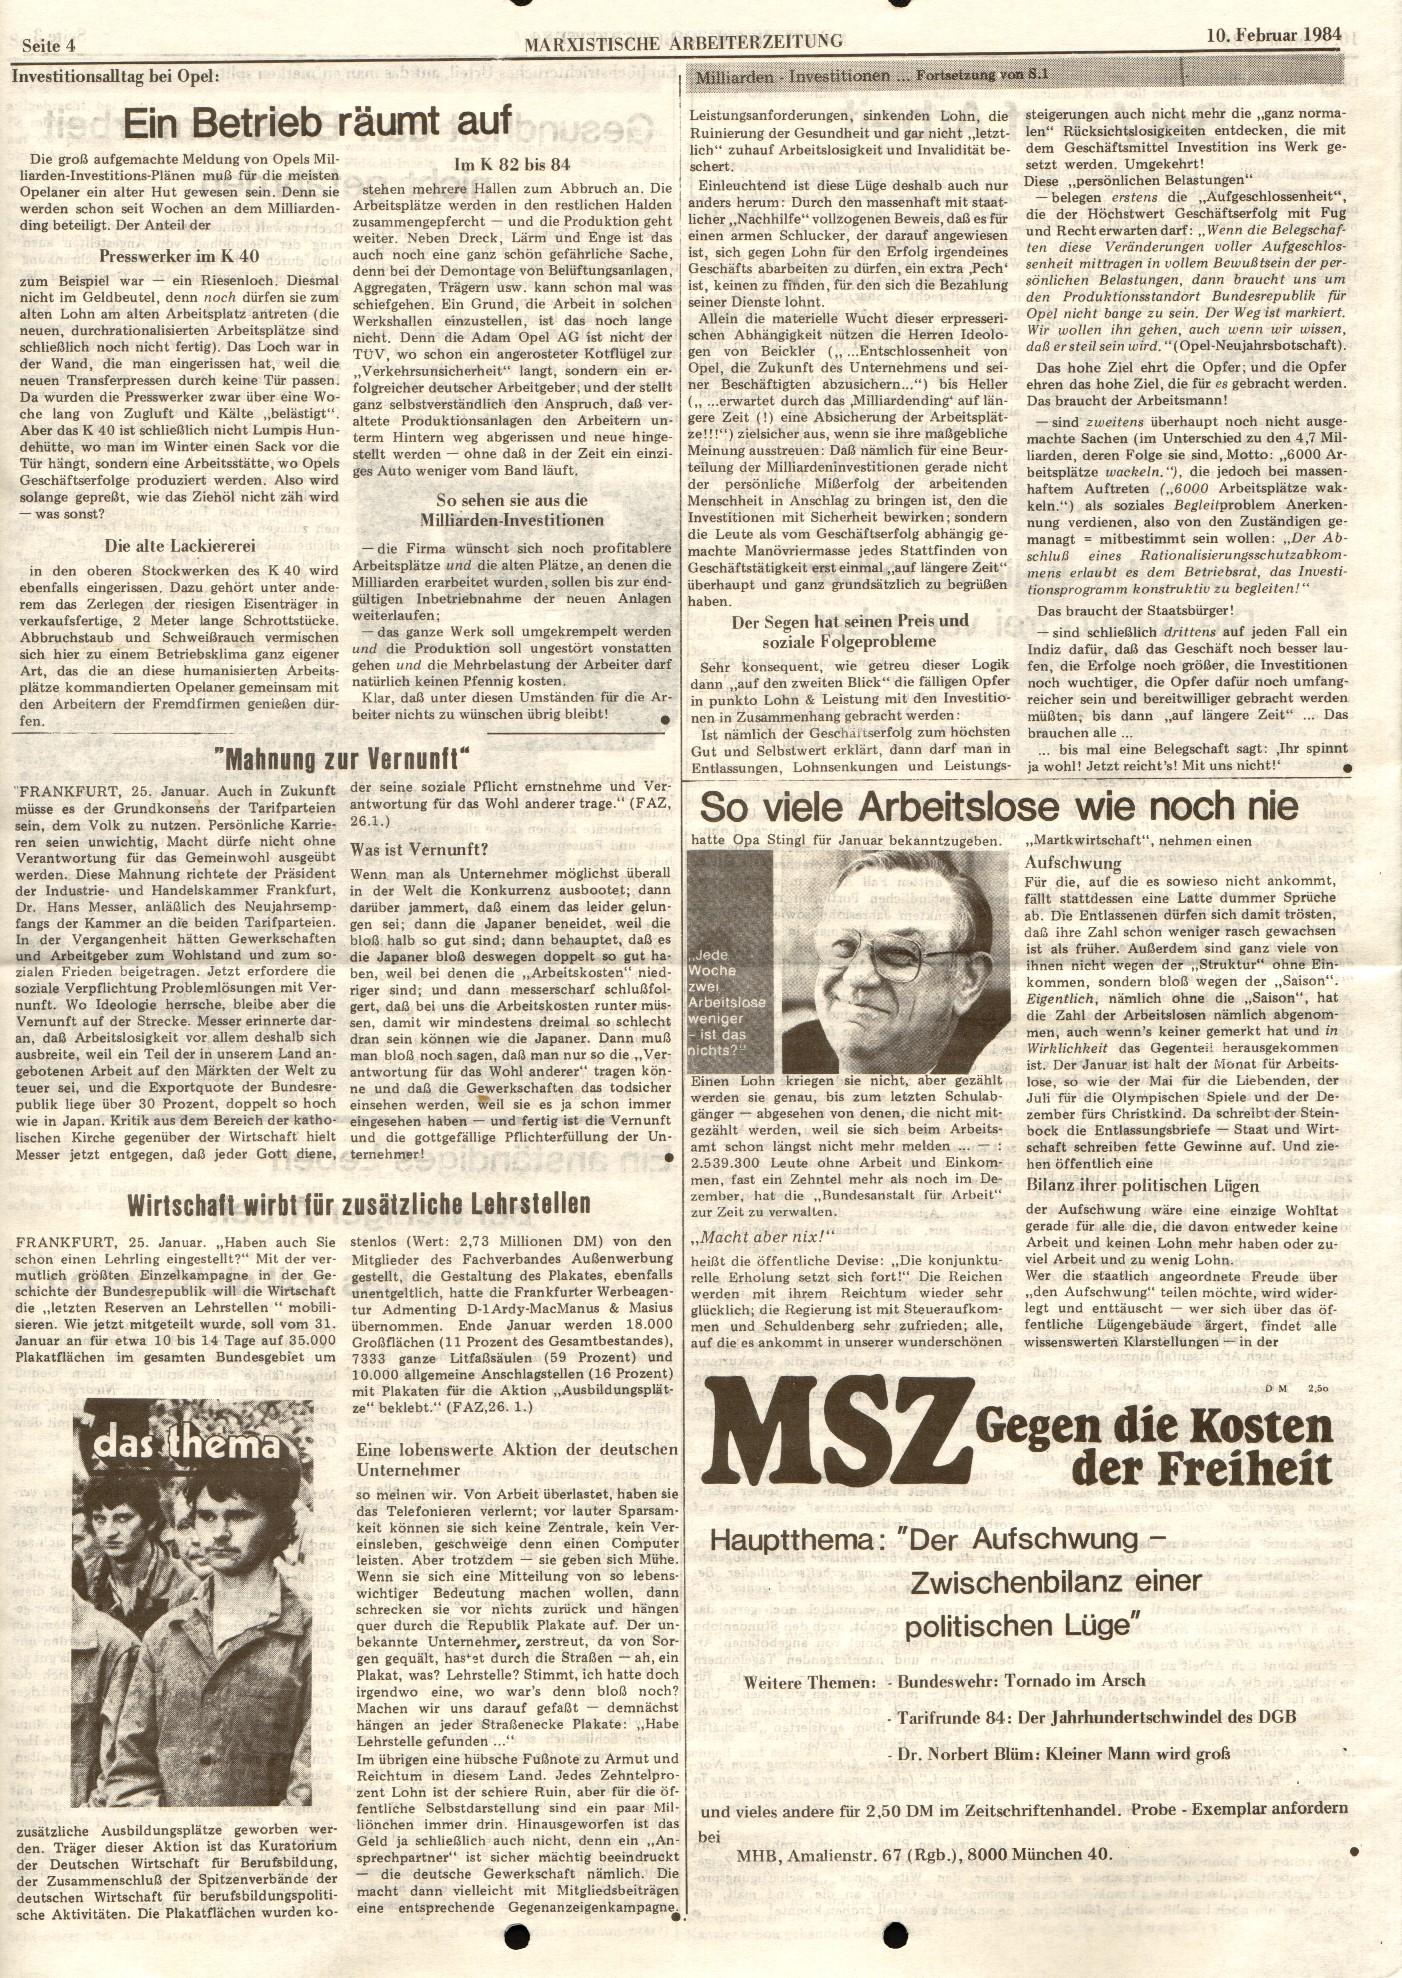 Ruesselsheim_MG_Marxistische_Arbeiterzeitung_Opel_19840210_04